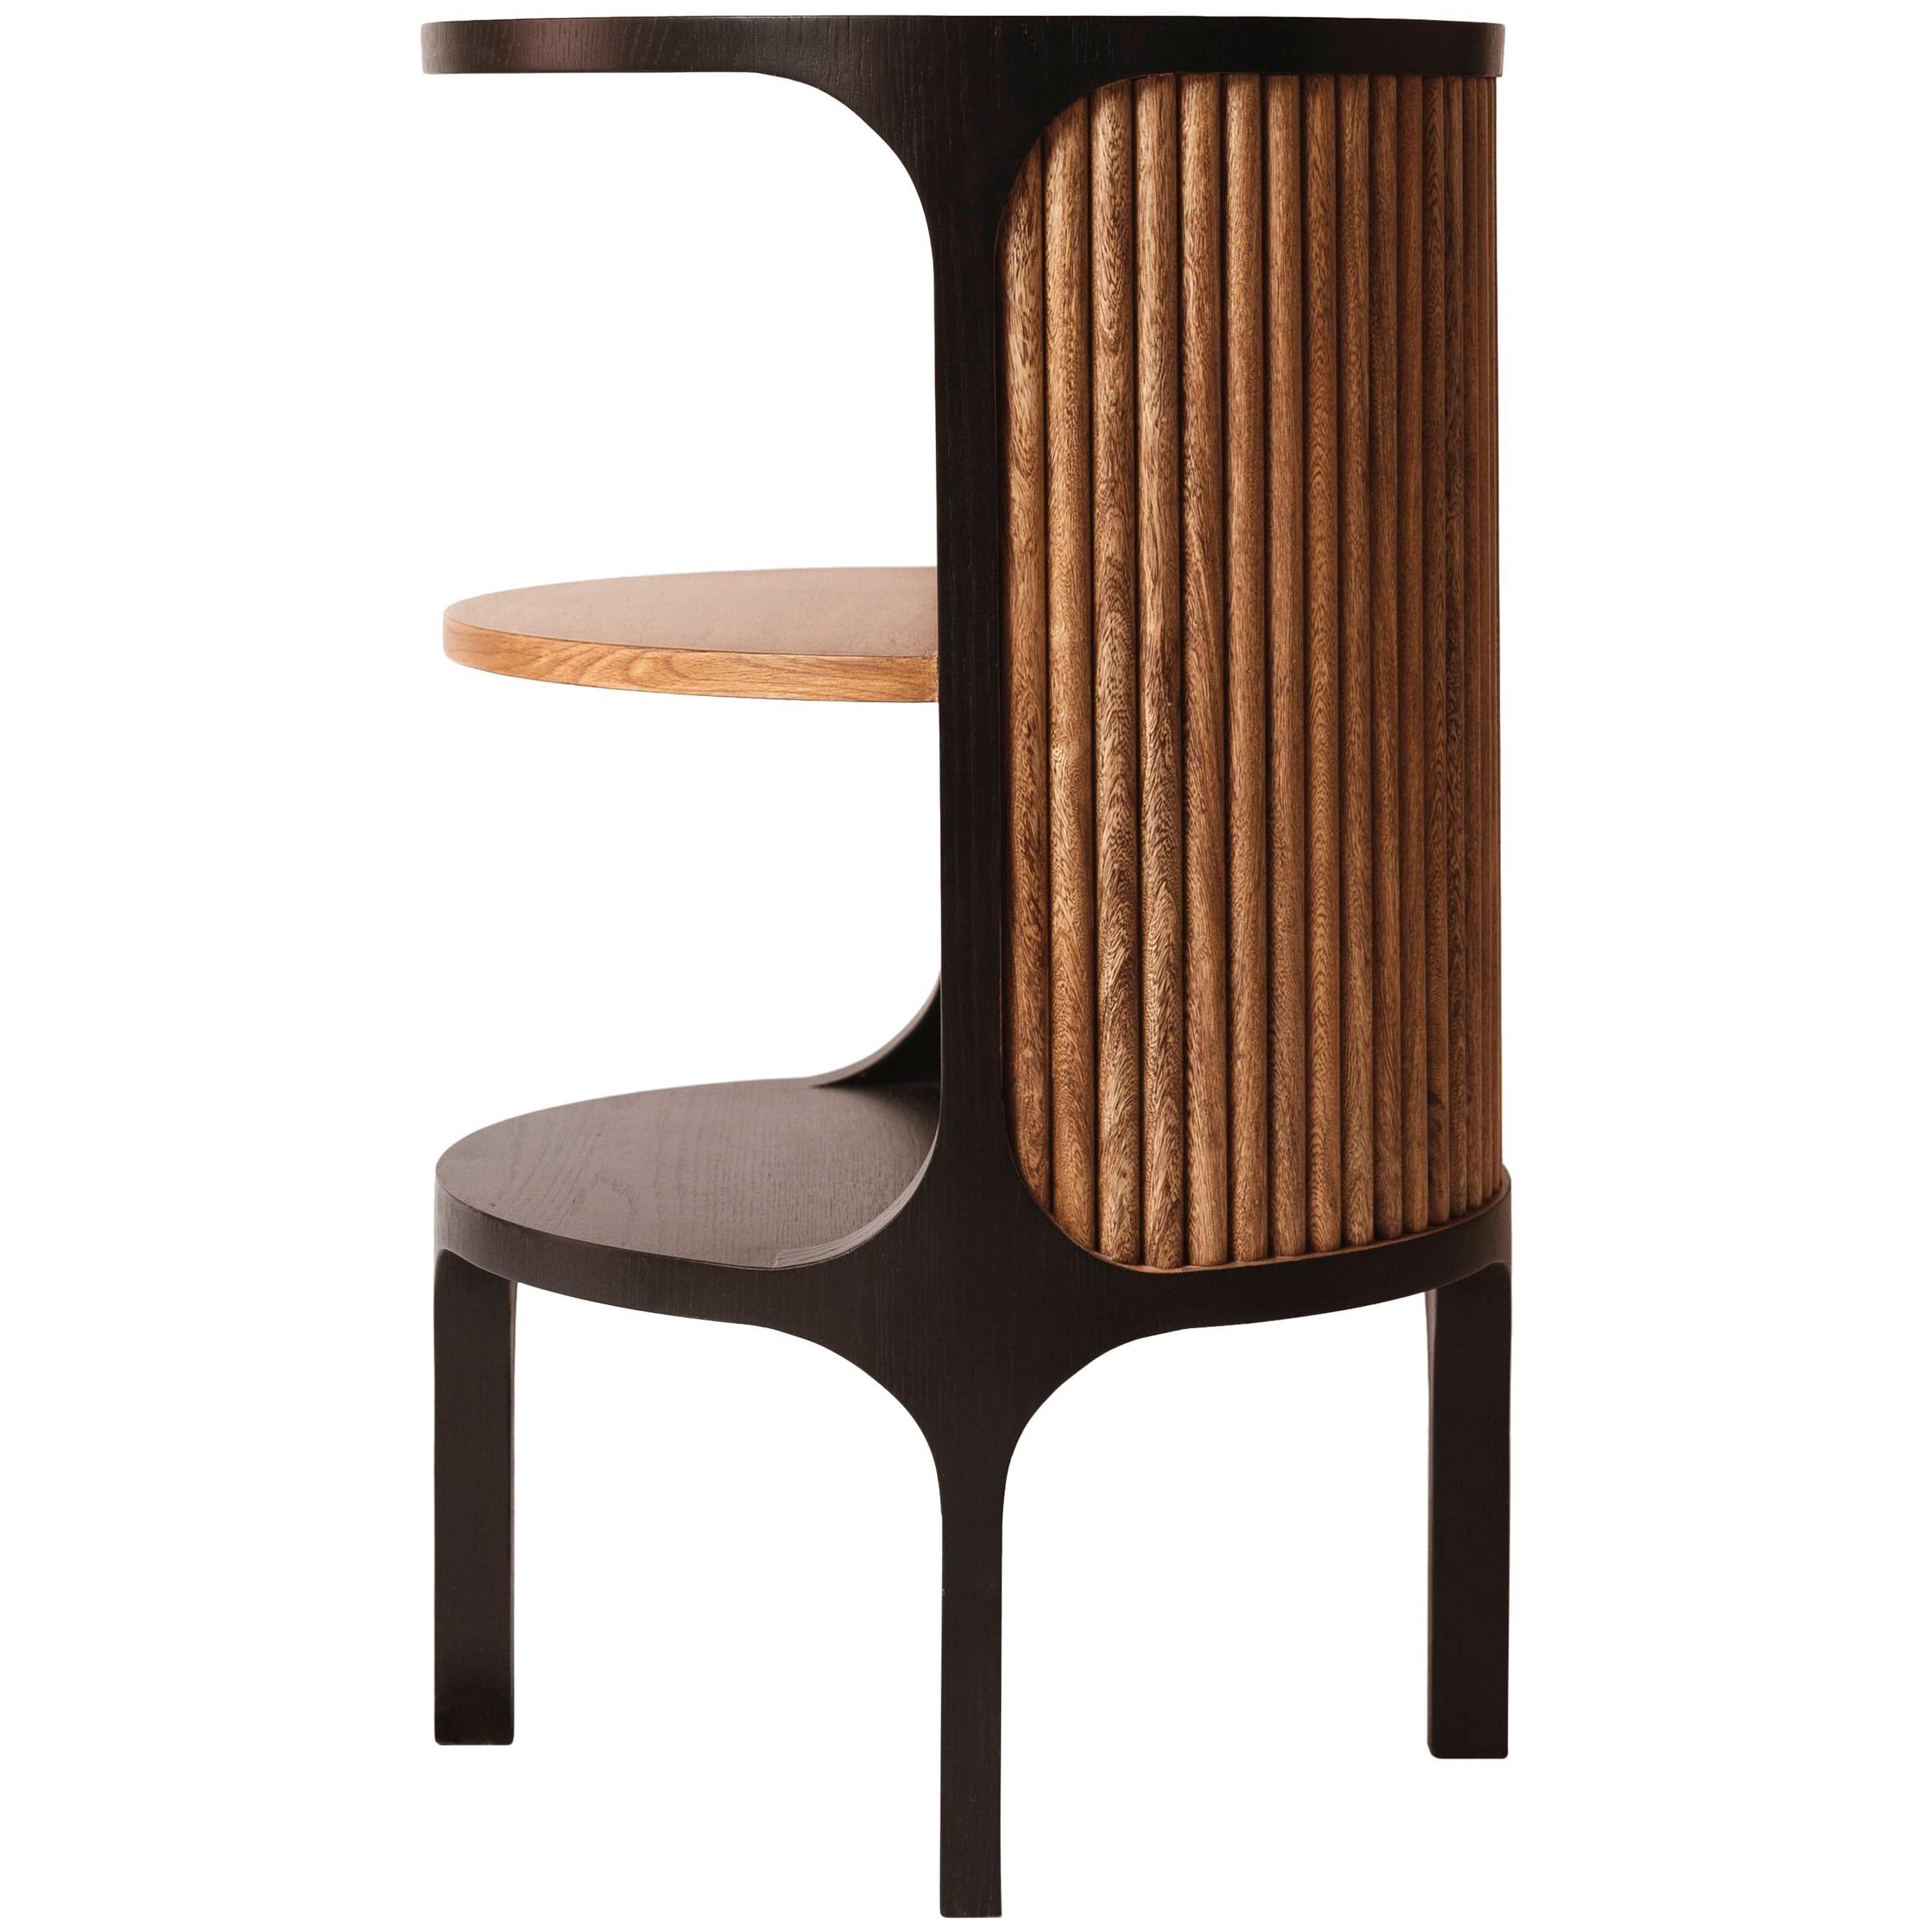 Art Deco Side Table in Oak Veneer and Pink Poui